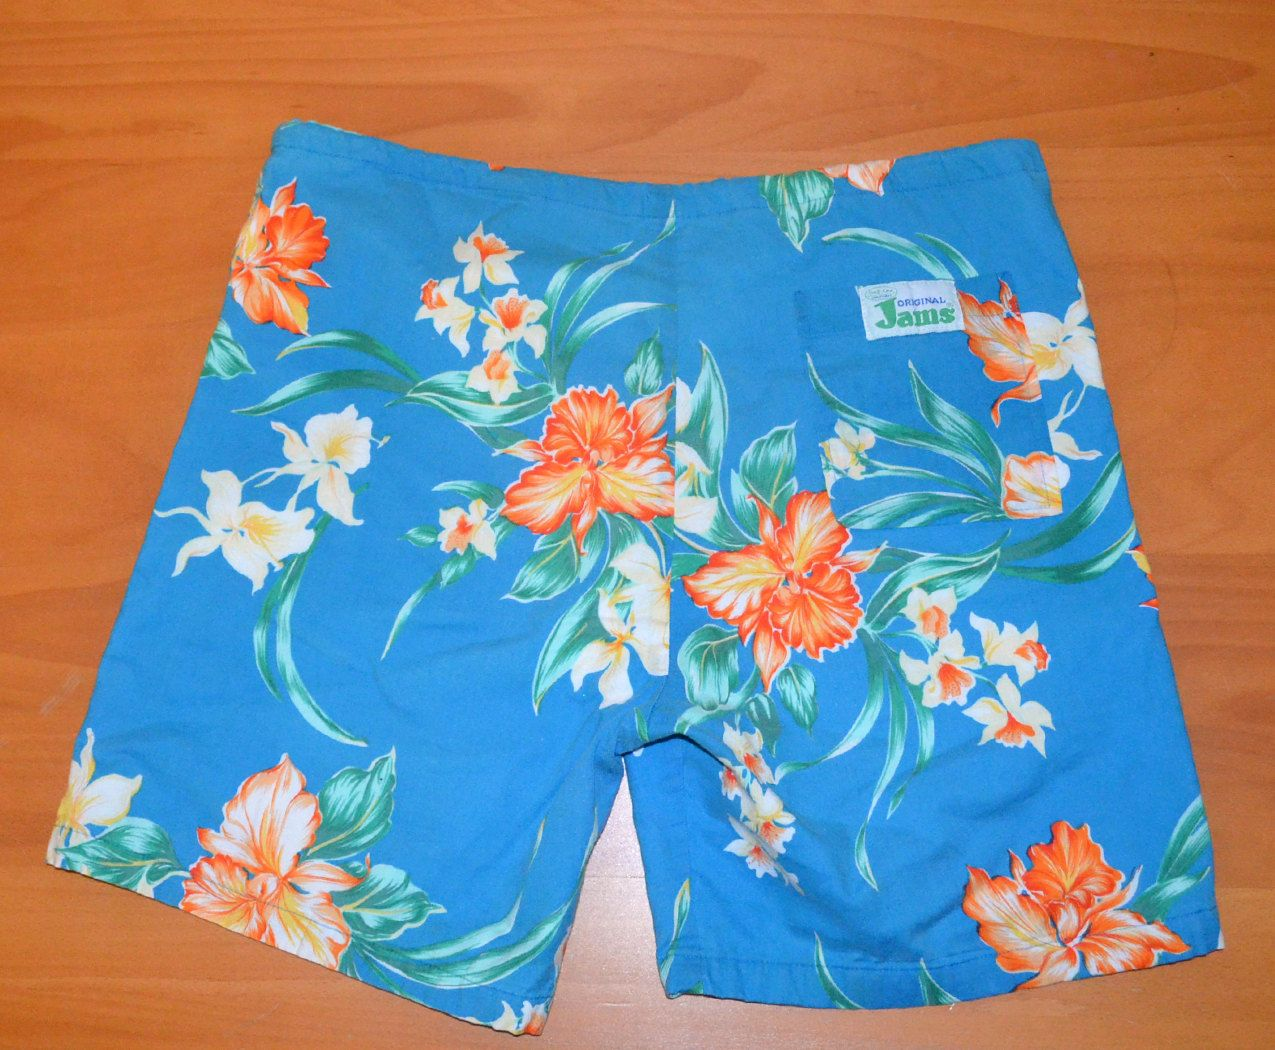 80s shorts jams